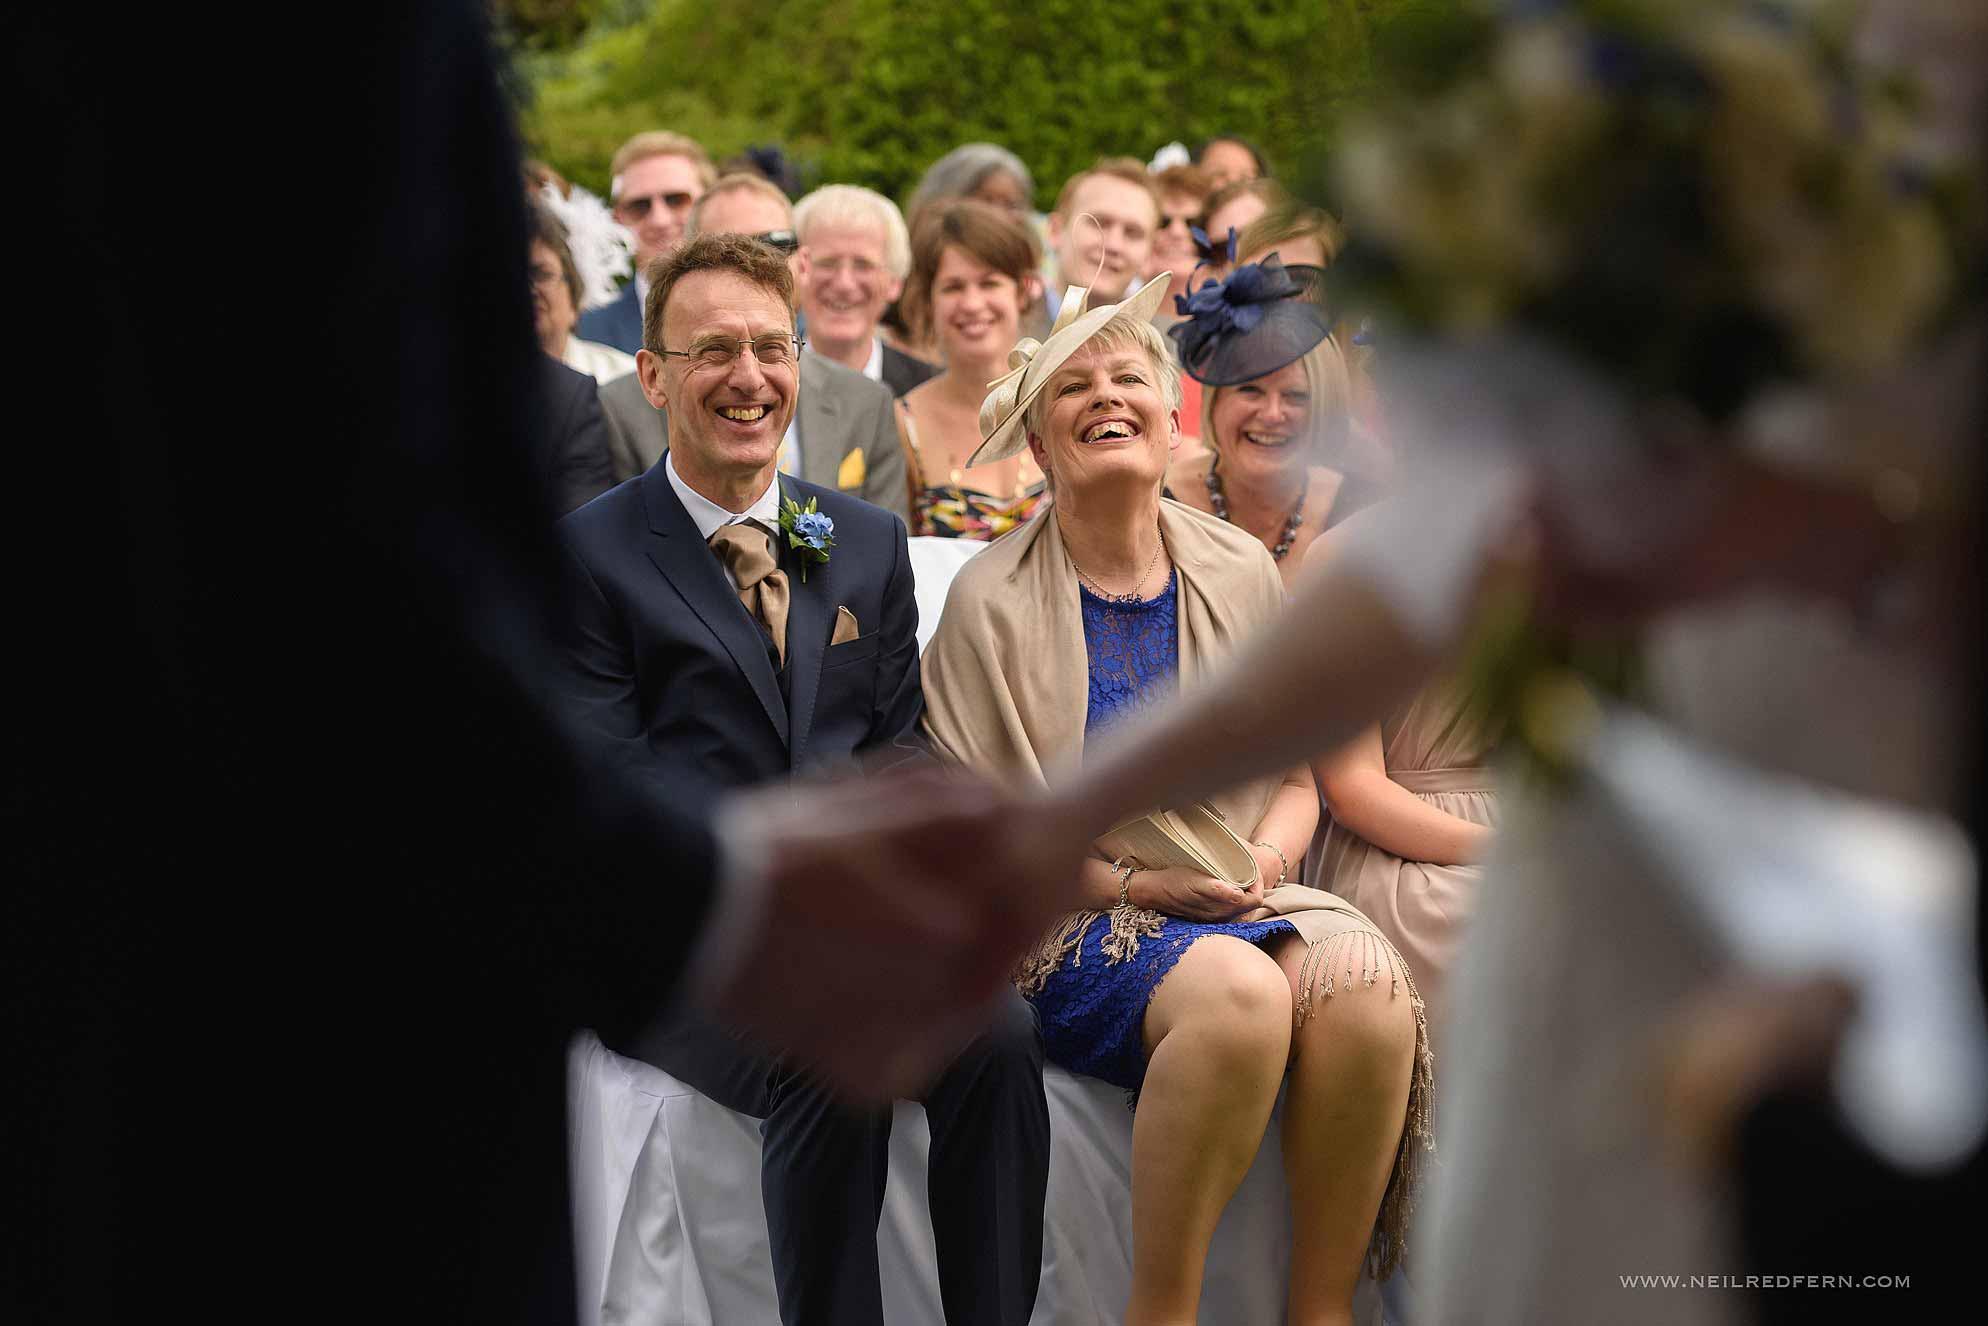 outdoor-wedding-ceremony-in-cheshire-4